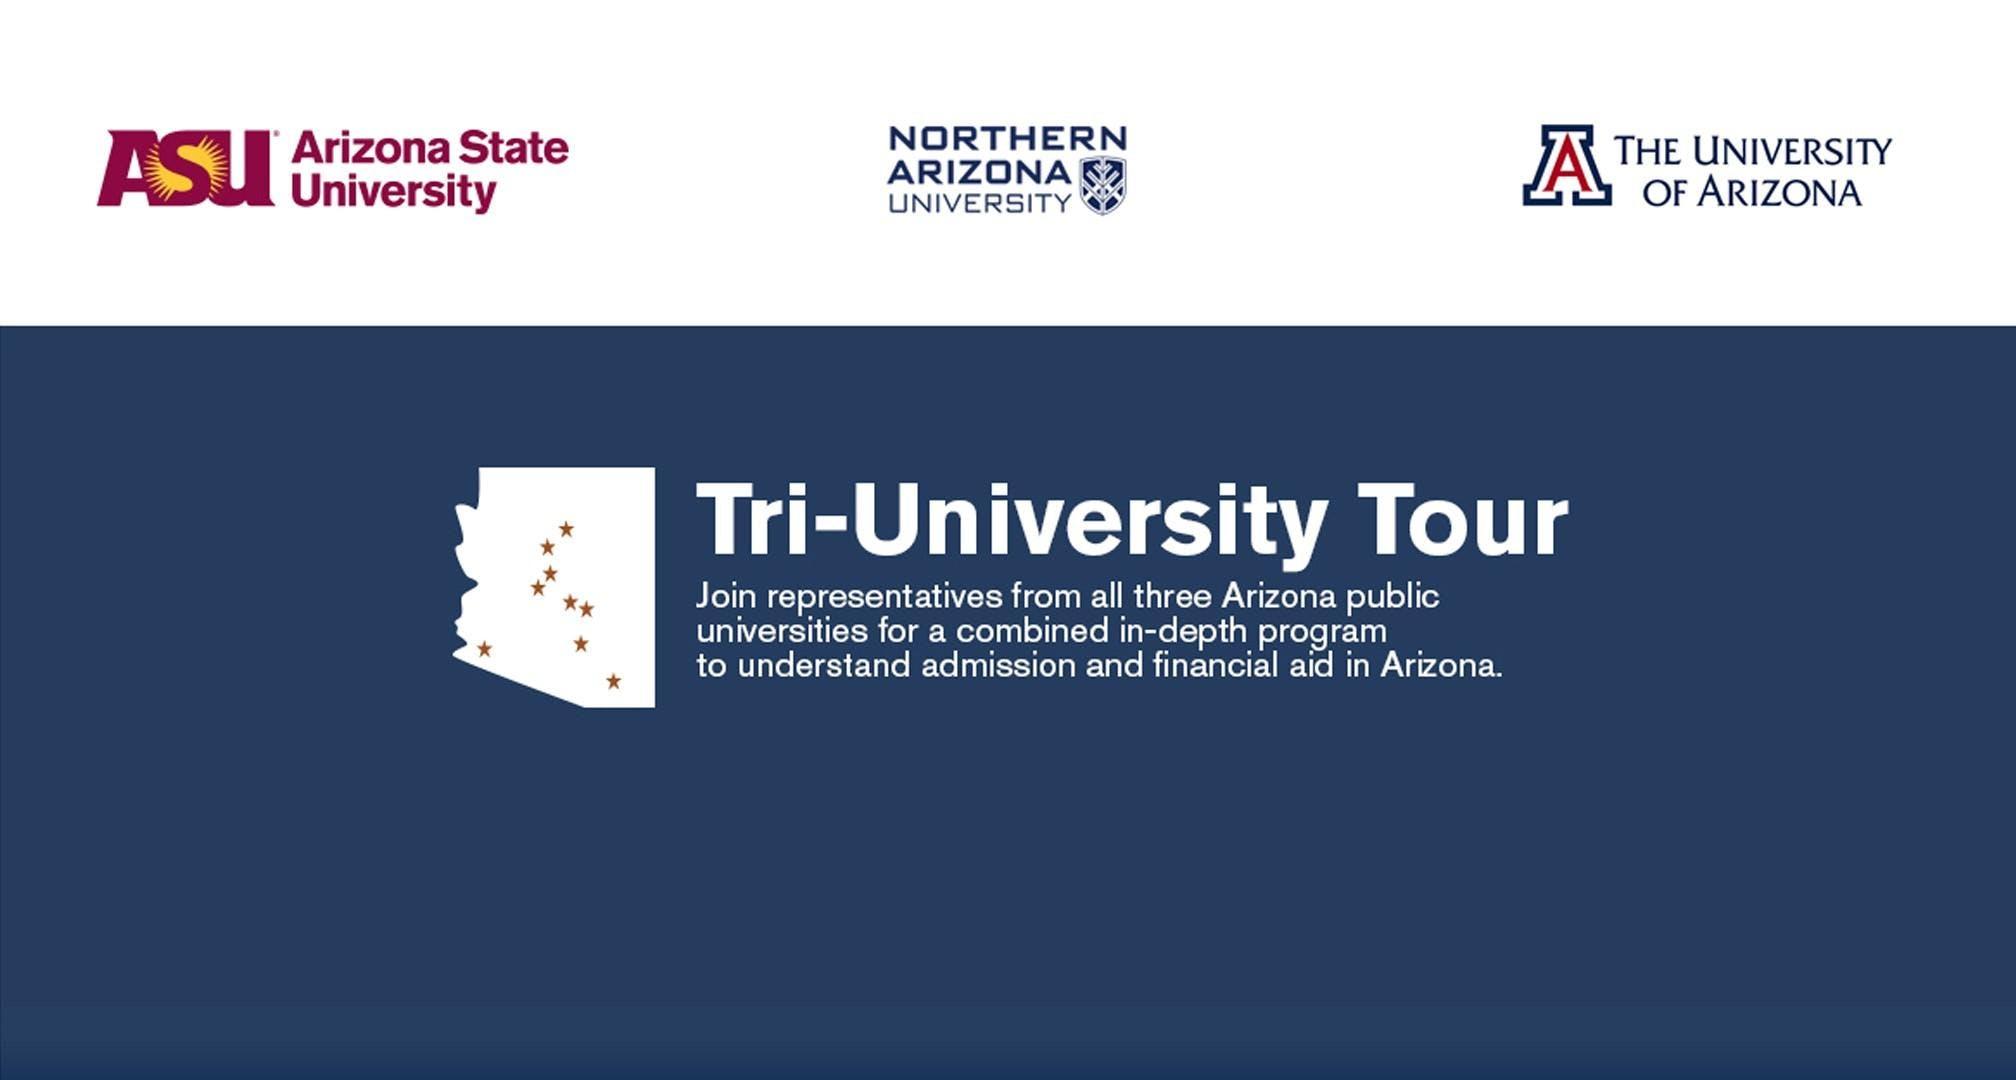 Tri-University - BASIS event